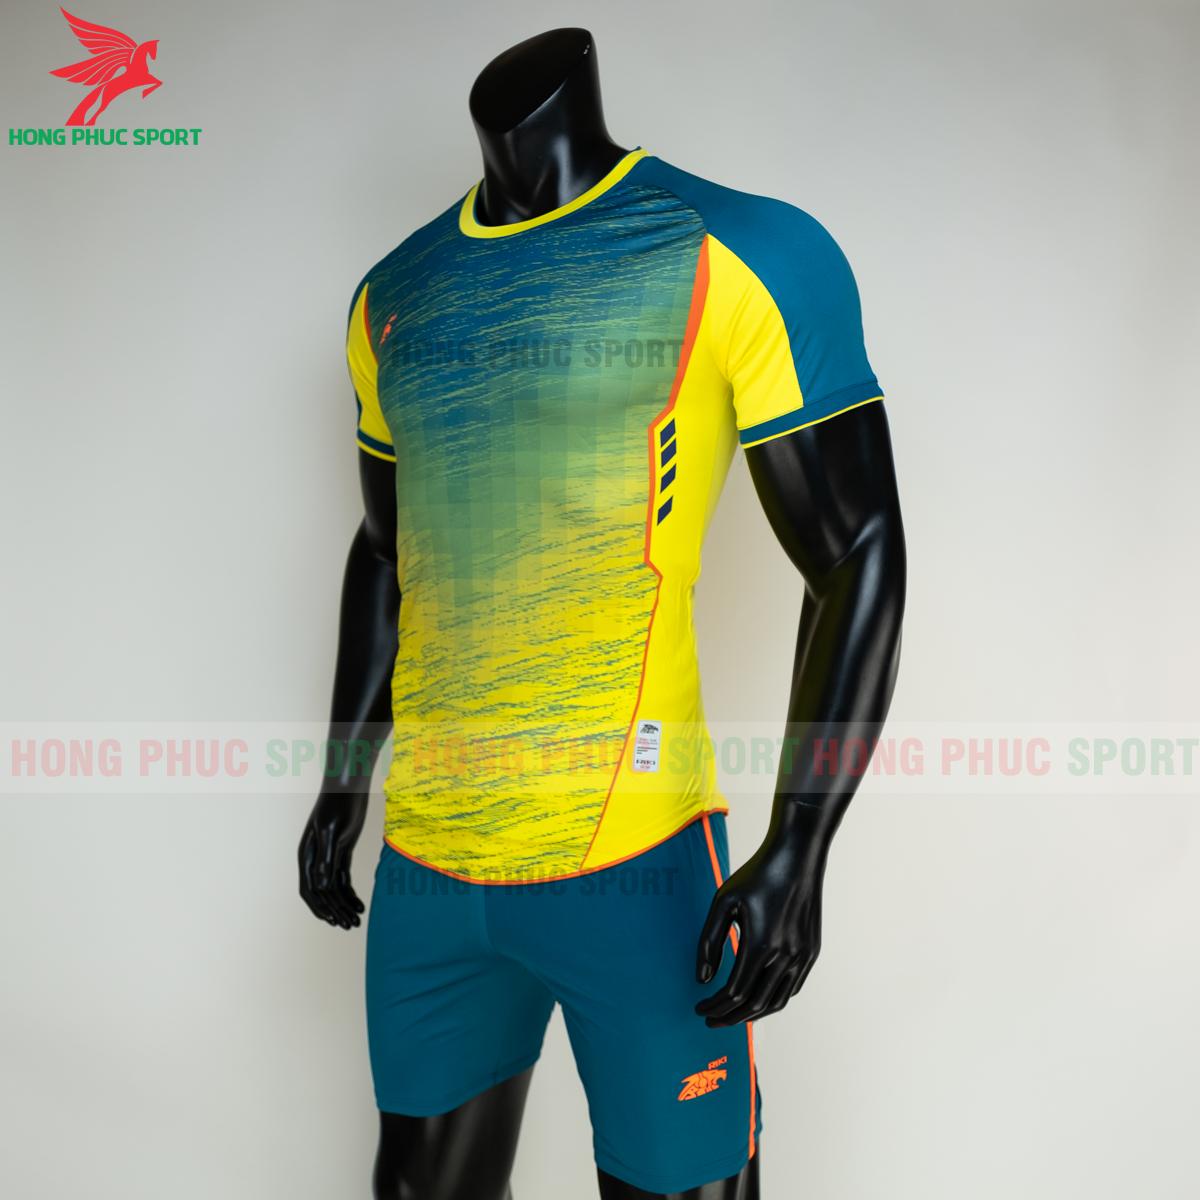 https://cdn.hongphucsport.com/unsafe/s4.shopbay.vn/files/285/ao-bong-da-khong-logo-riki-grambor-mau-vang-4-6050616068c7f.png